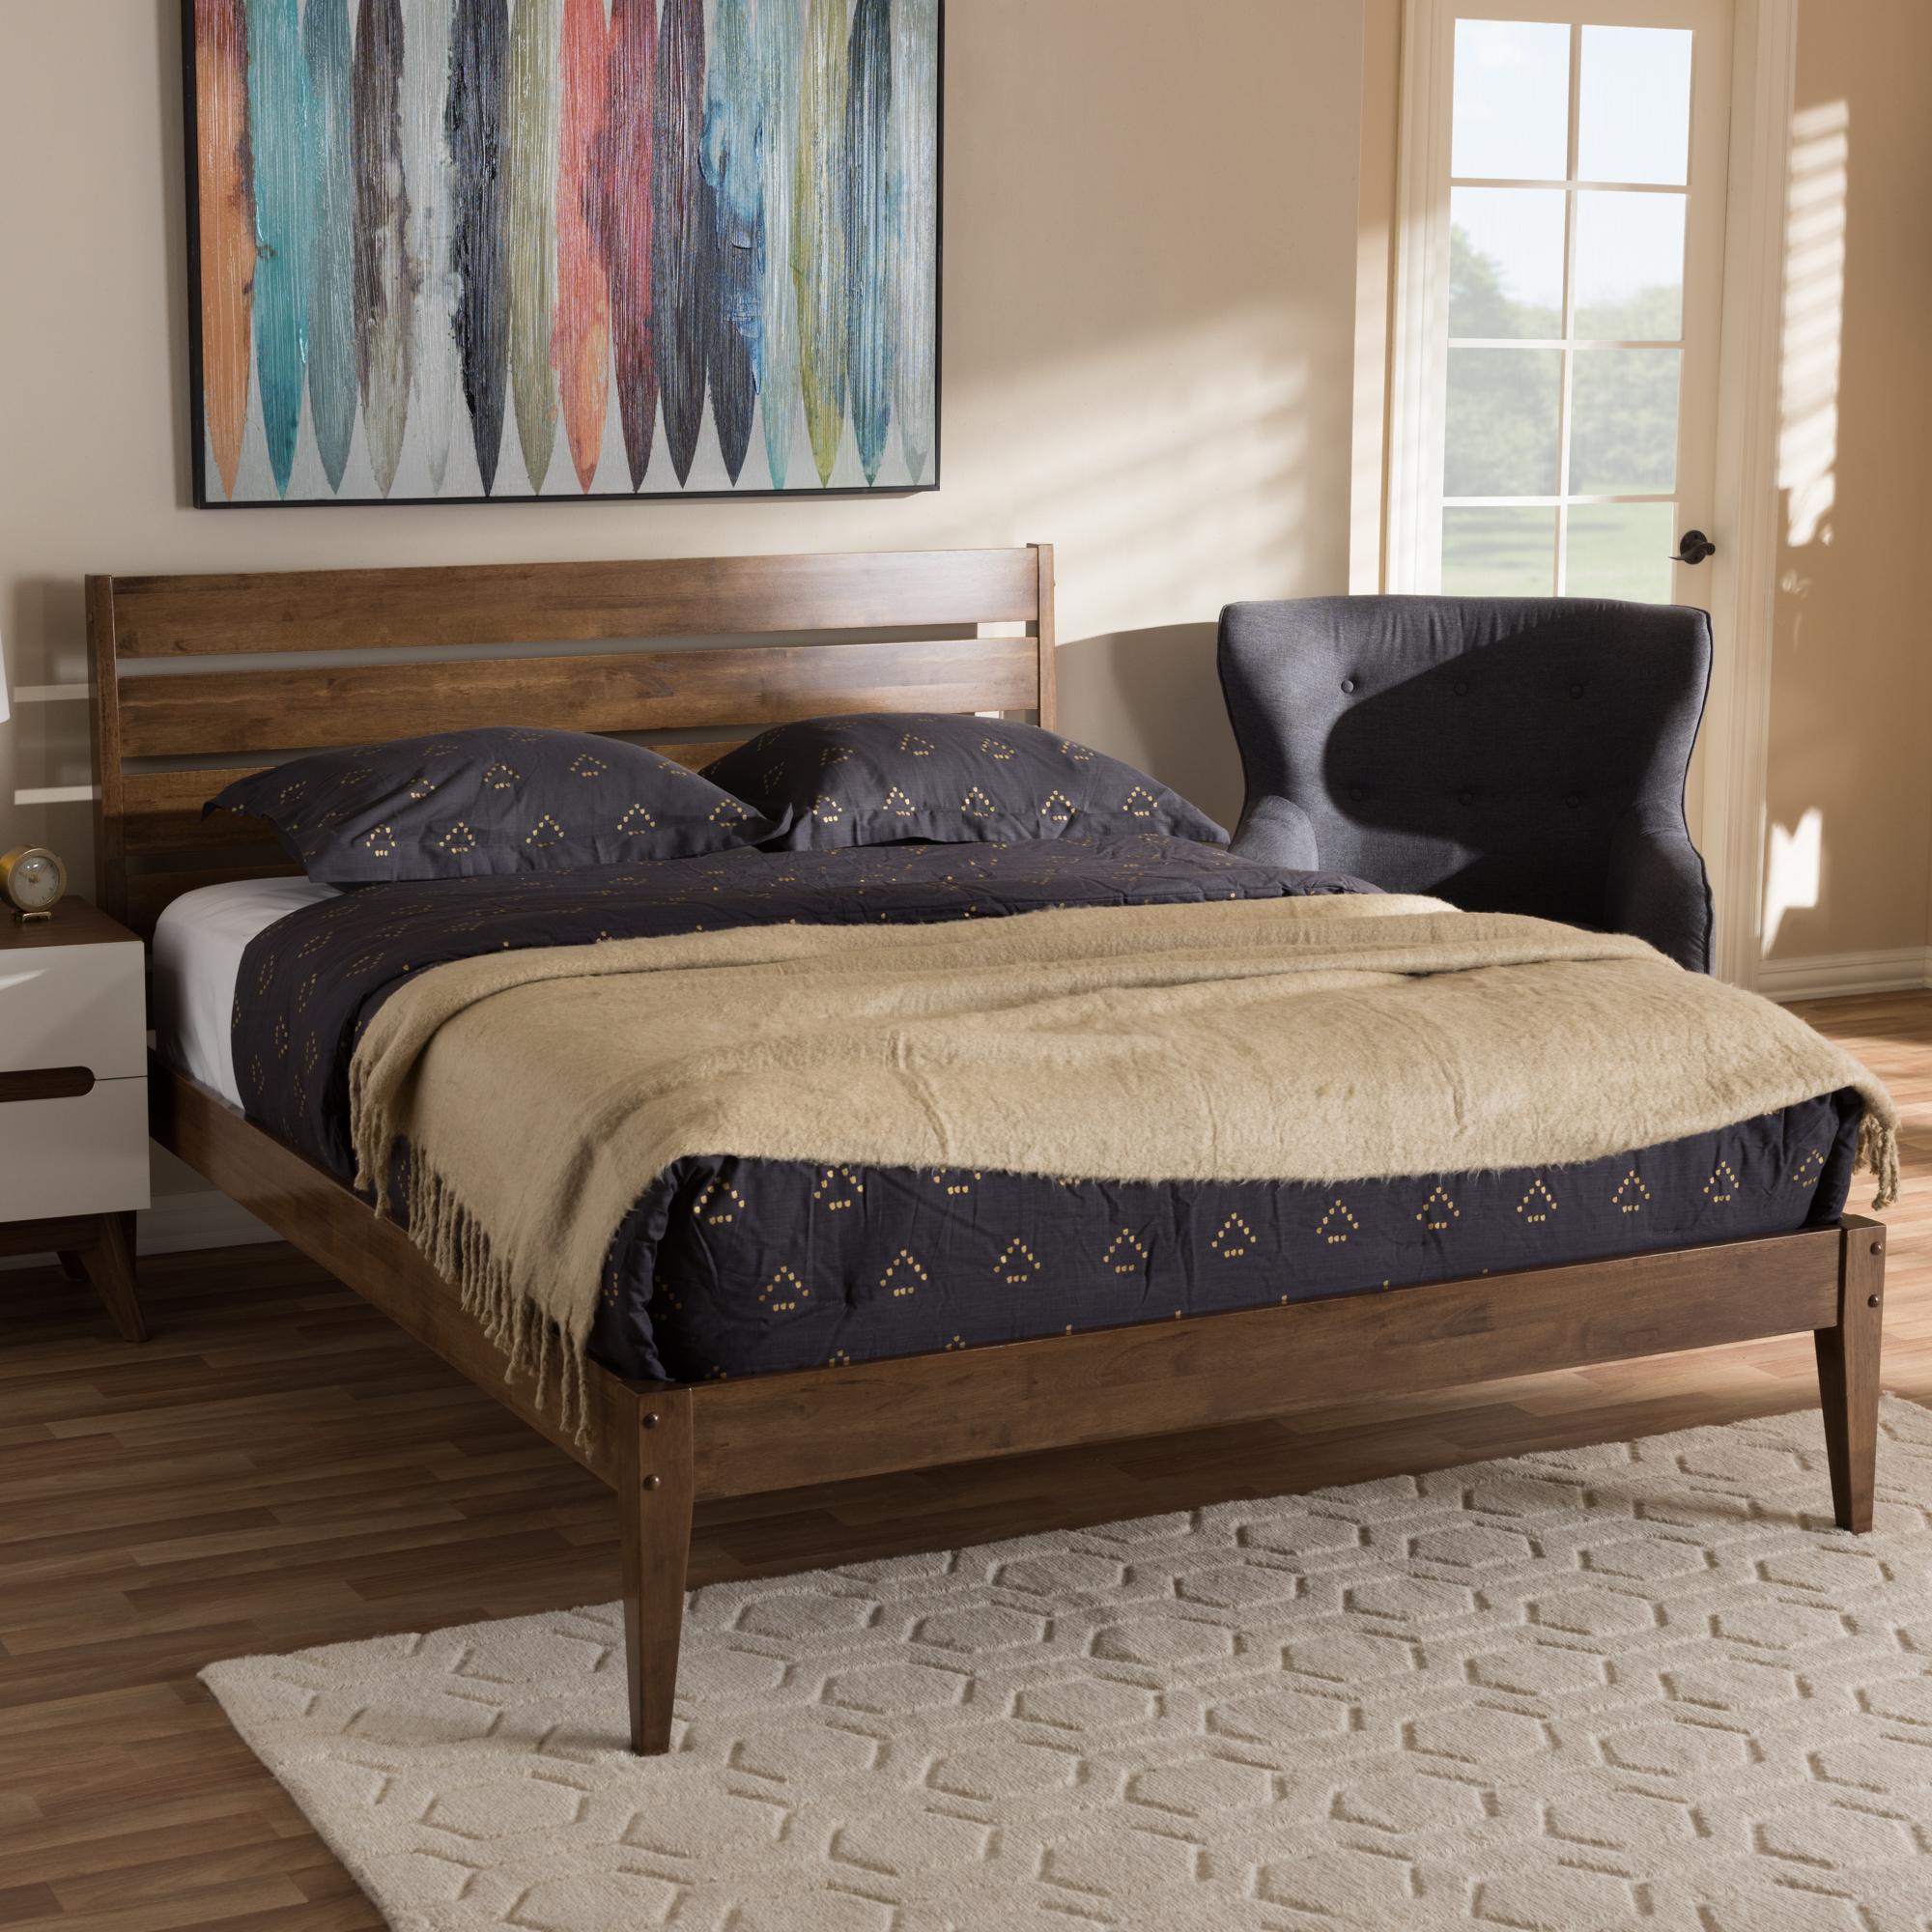 baxton studio elmdon midcentury modern solid walnut wood slatted headboard style king size platform